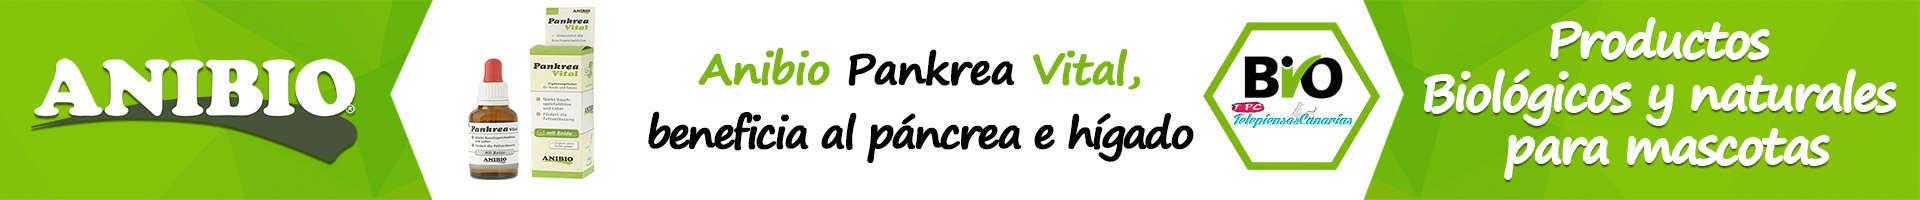 Anibio pankrea vital, refuerza el páncreas